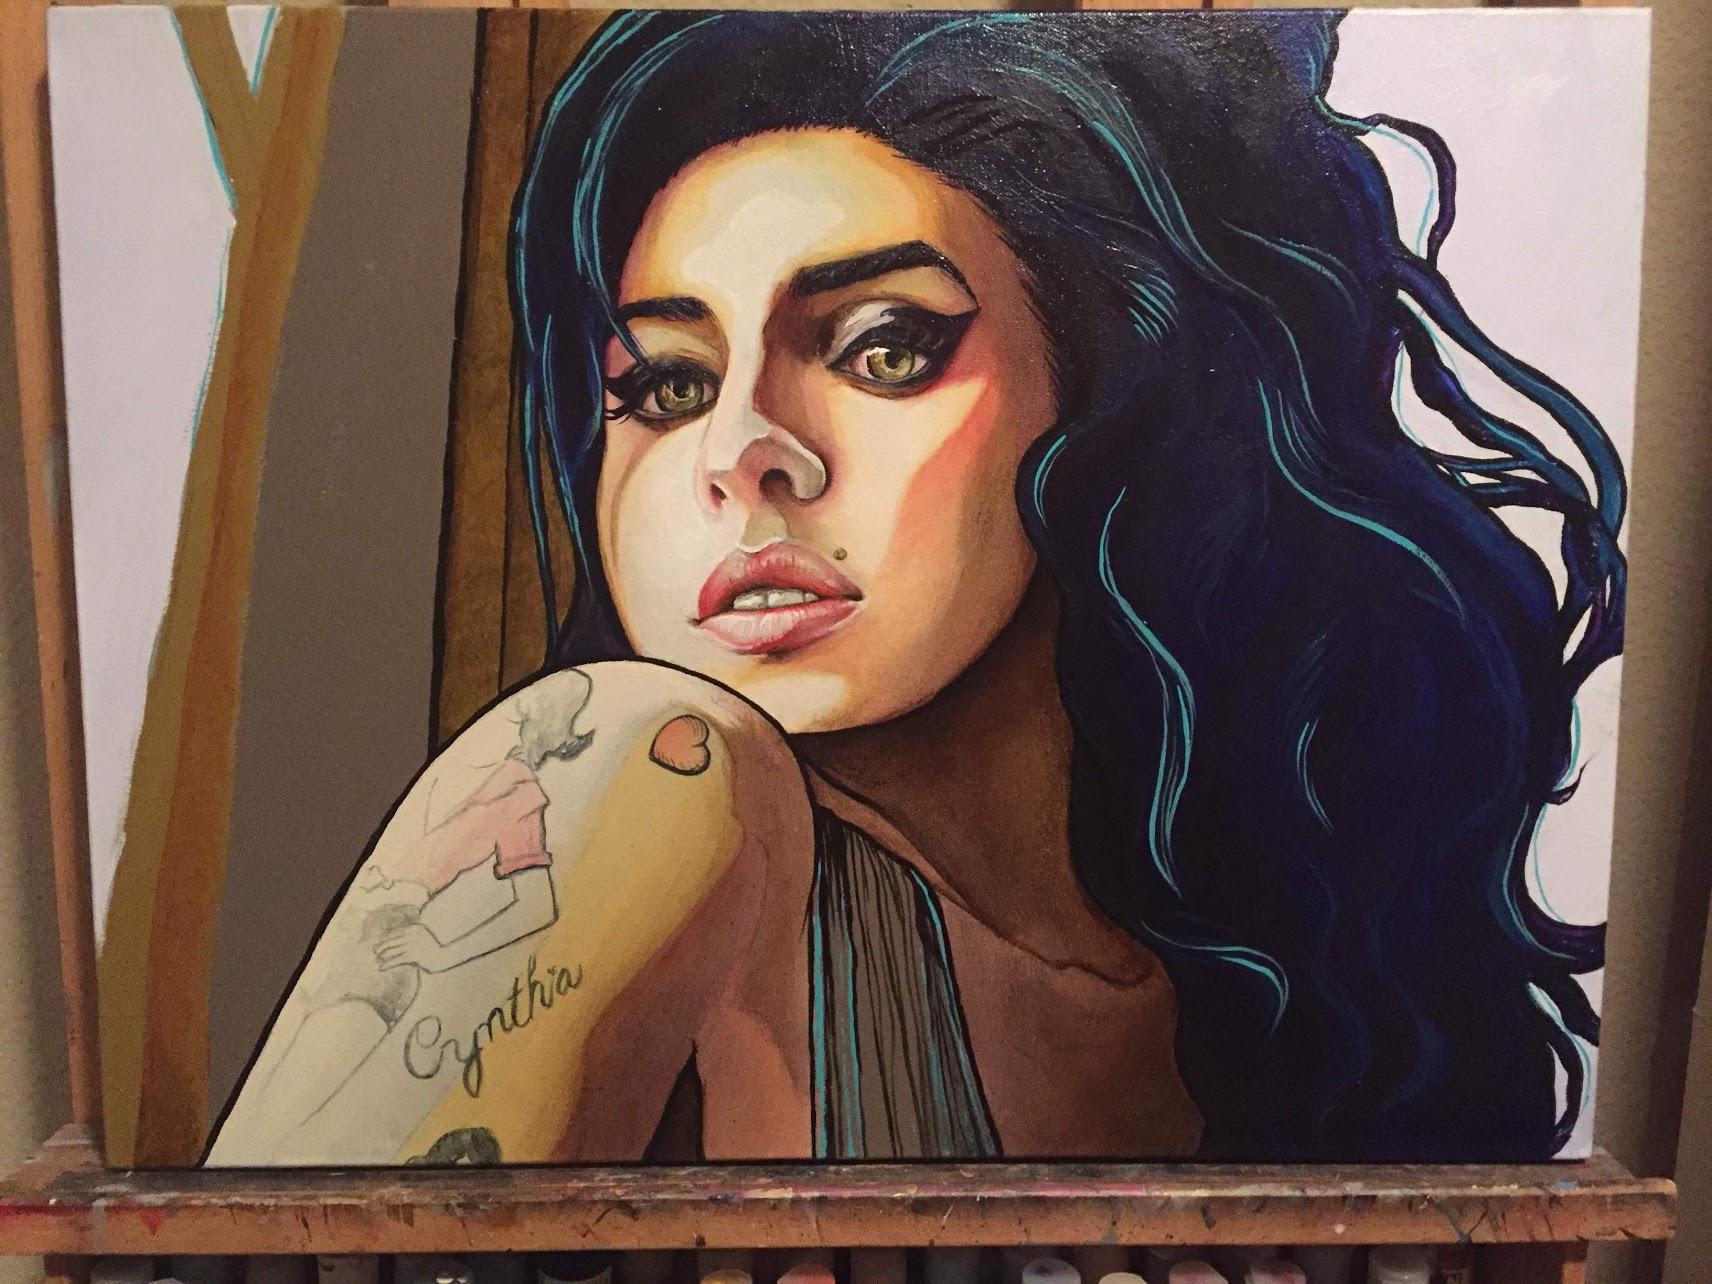 acrylic. in progress.